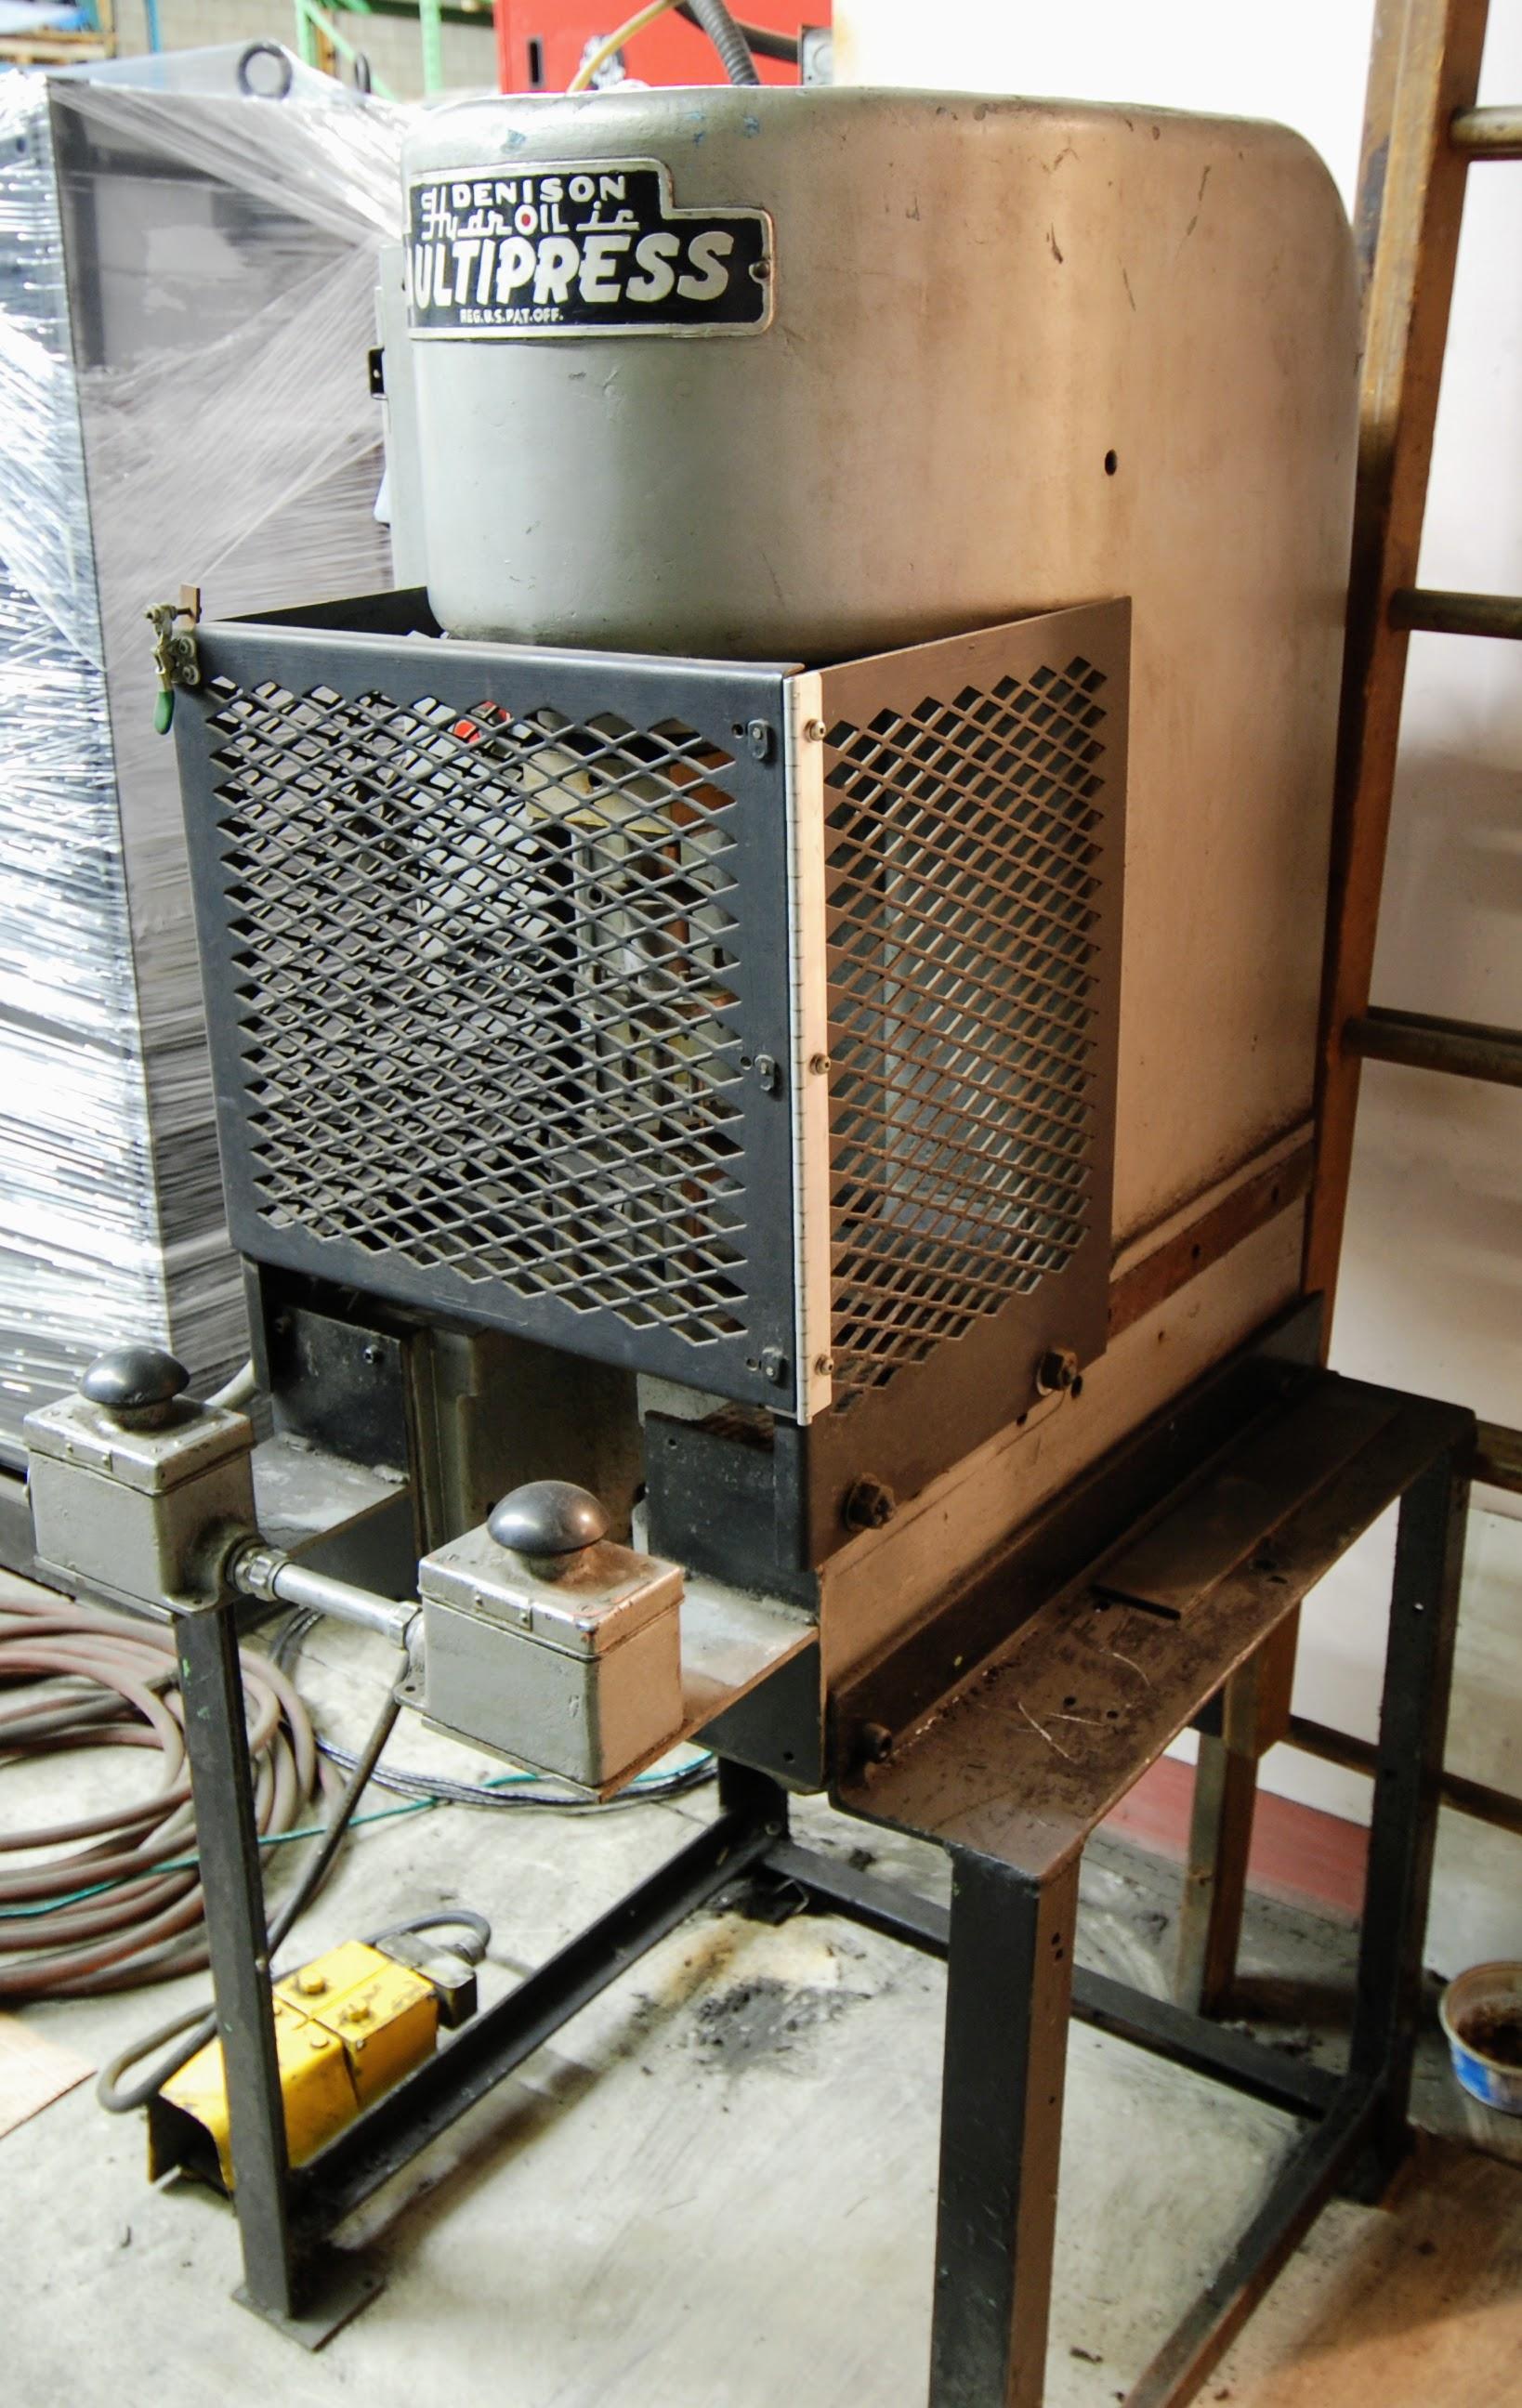 DENISON HYDROIL 5HP MULTIPRESS - Image 5 of 6